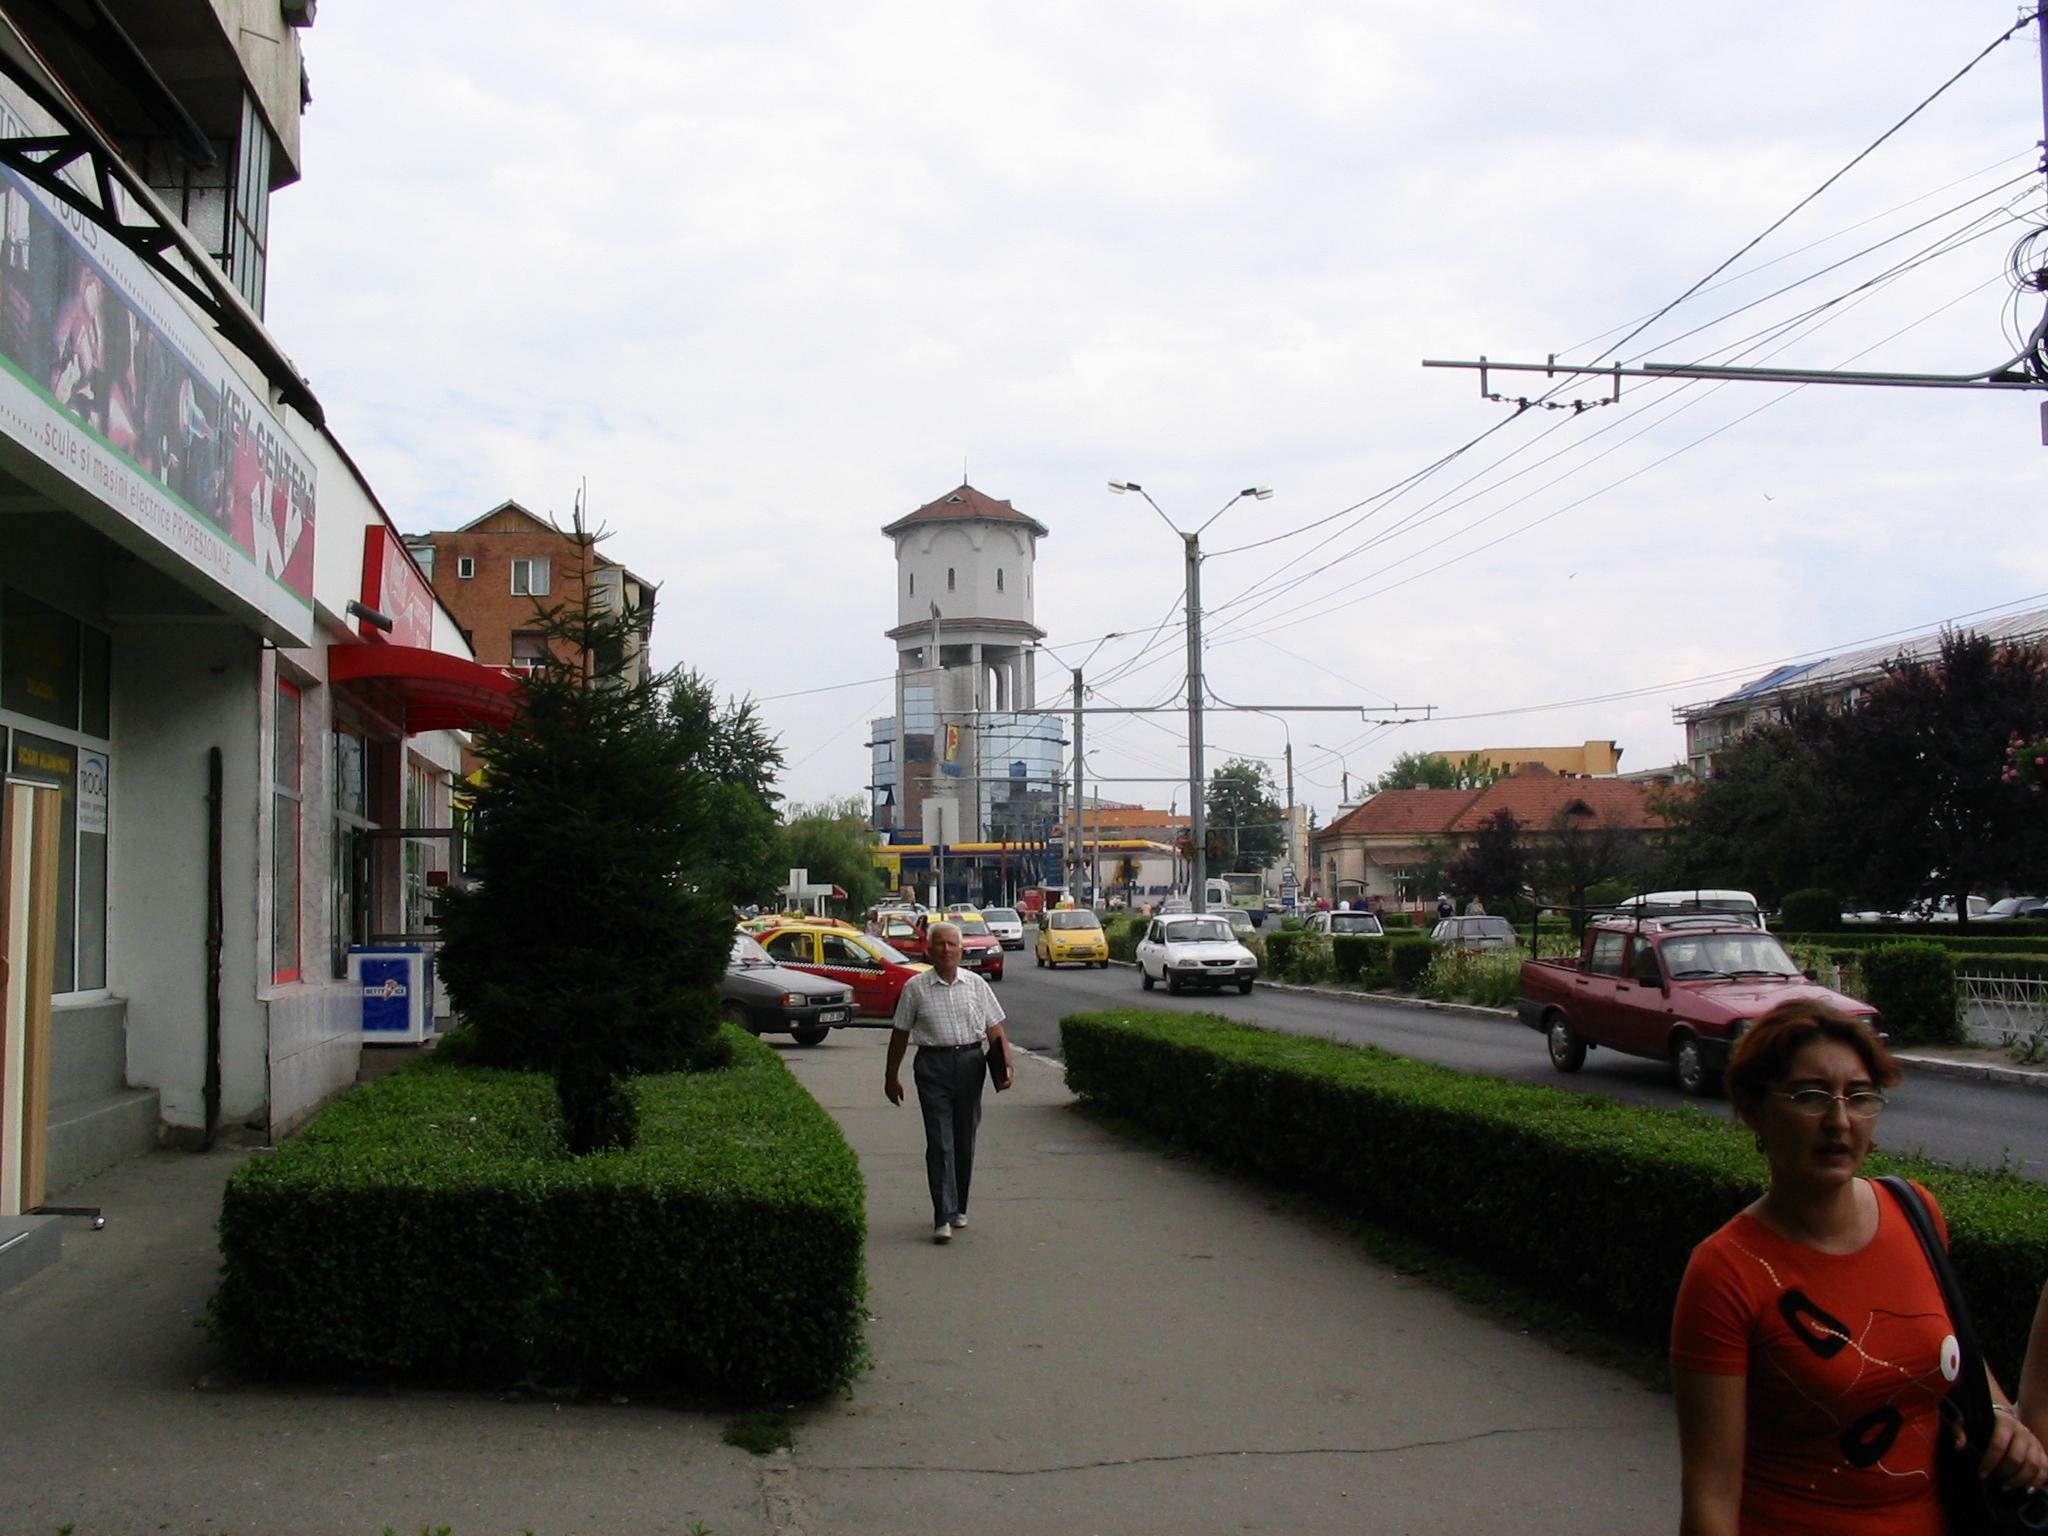 http://www.complang.tuwien.ac.at/anton/photos/europa2006/full/img_3030.jpg